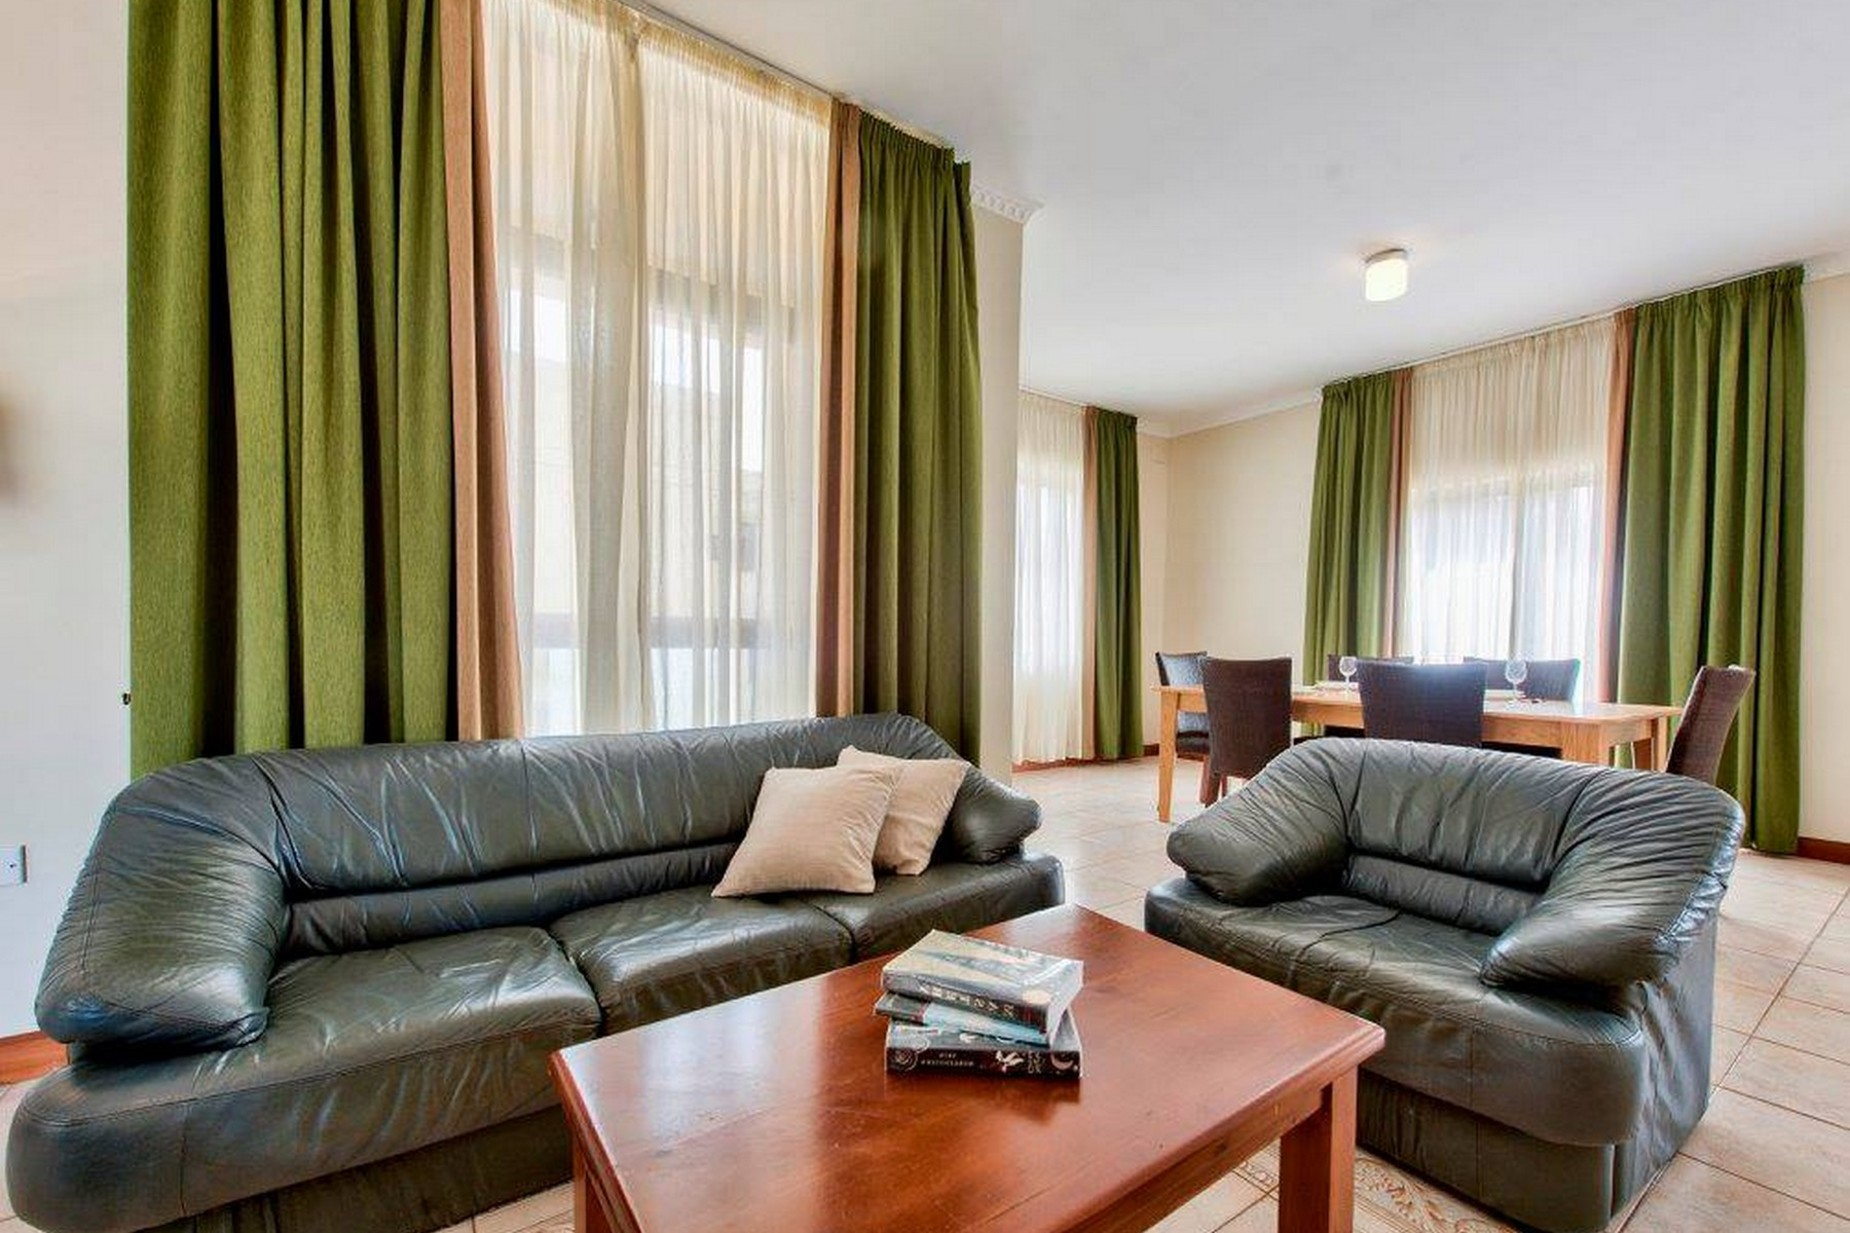 3 bed Villa For Rent in Mellieha, Mellieha - thumb 2